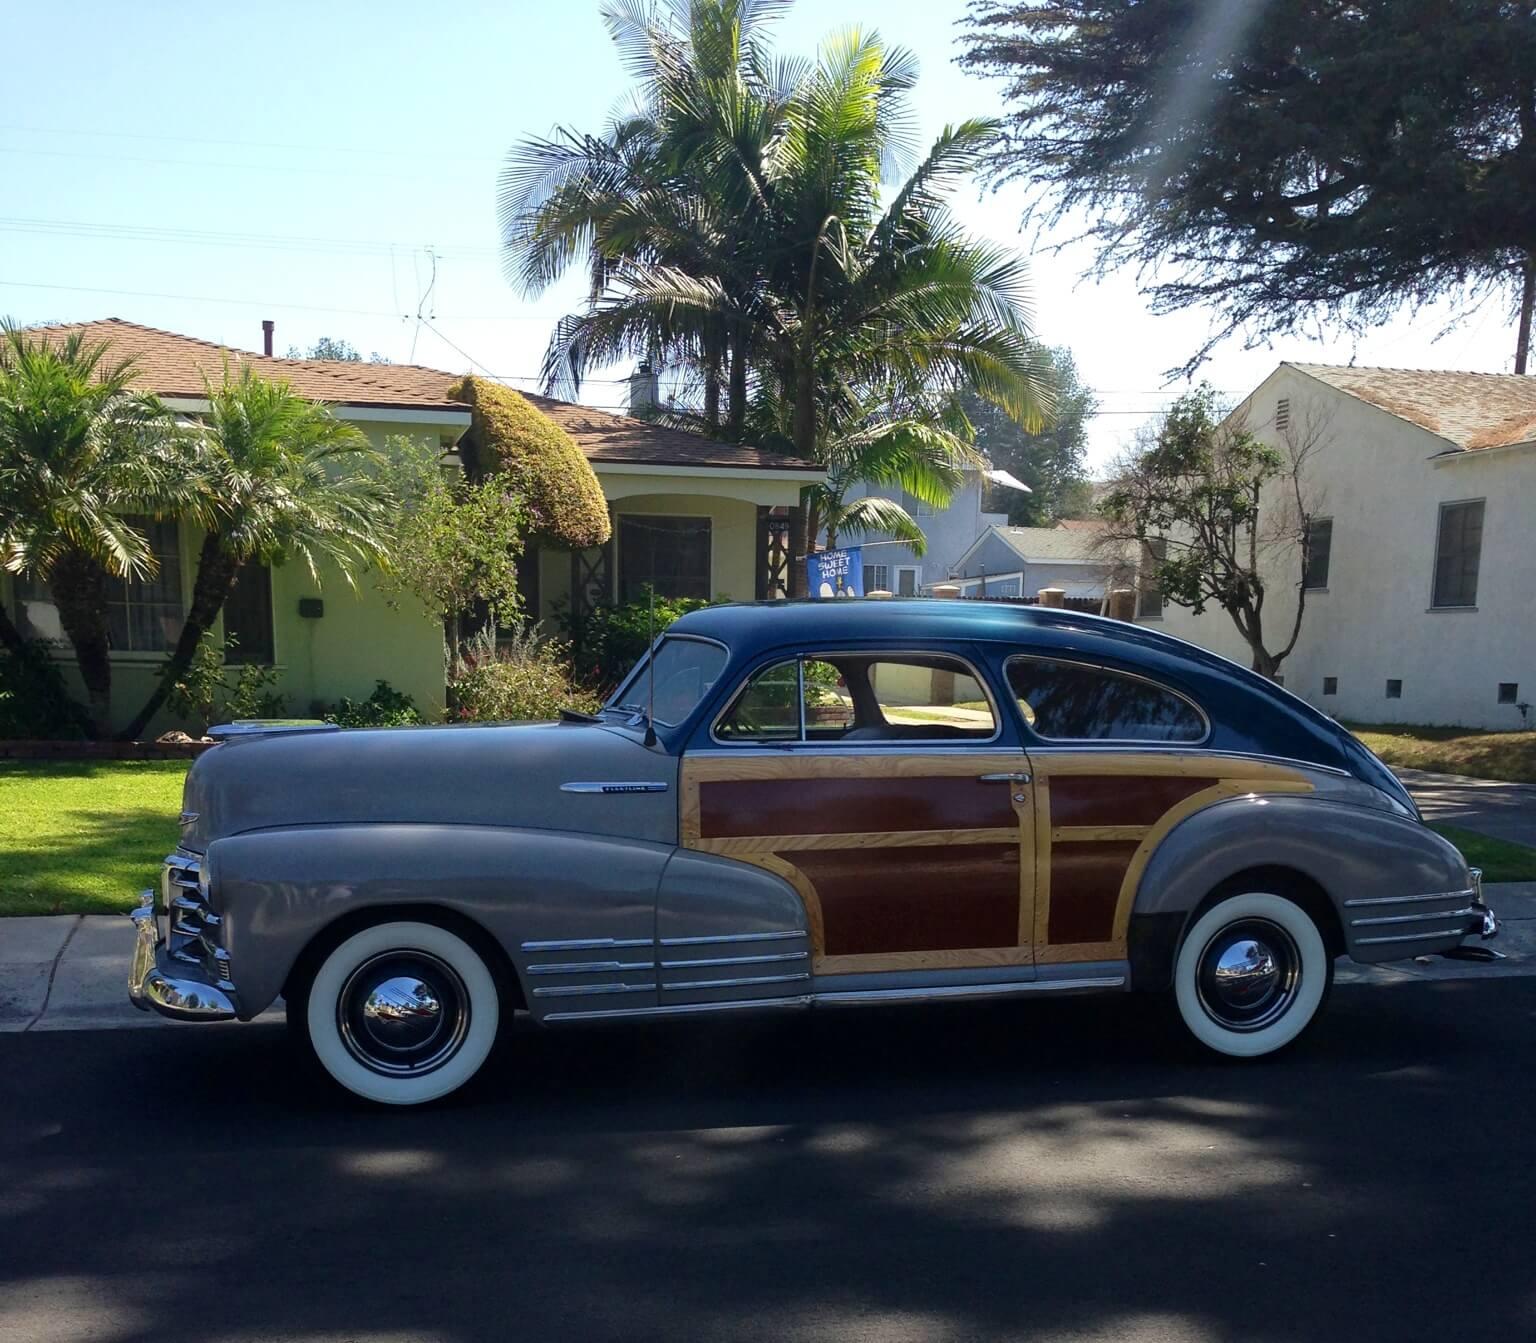 lehder-rudy-car1.jpg